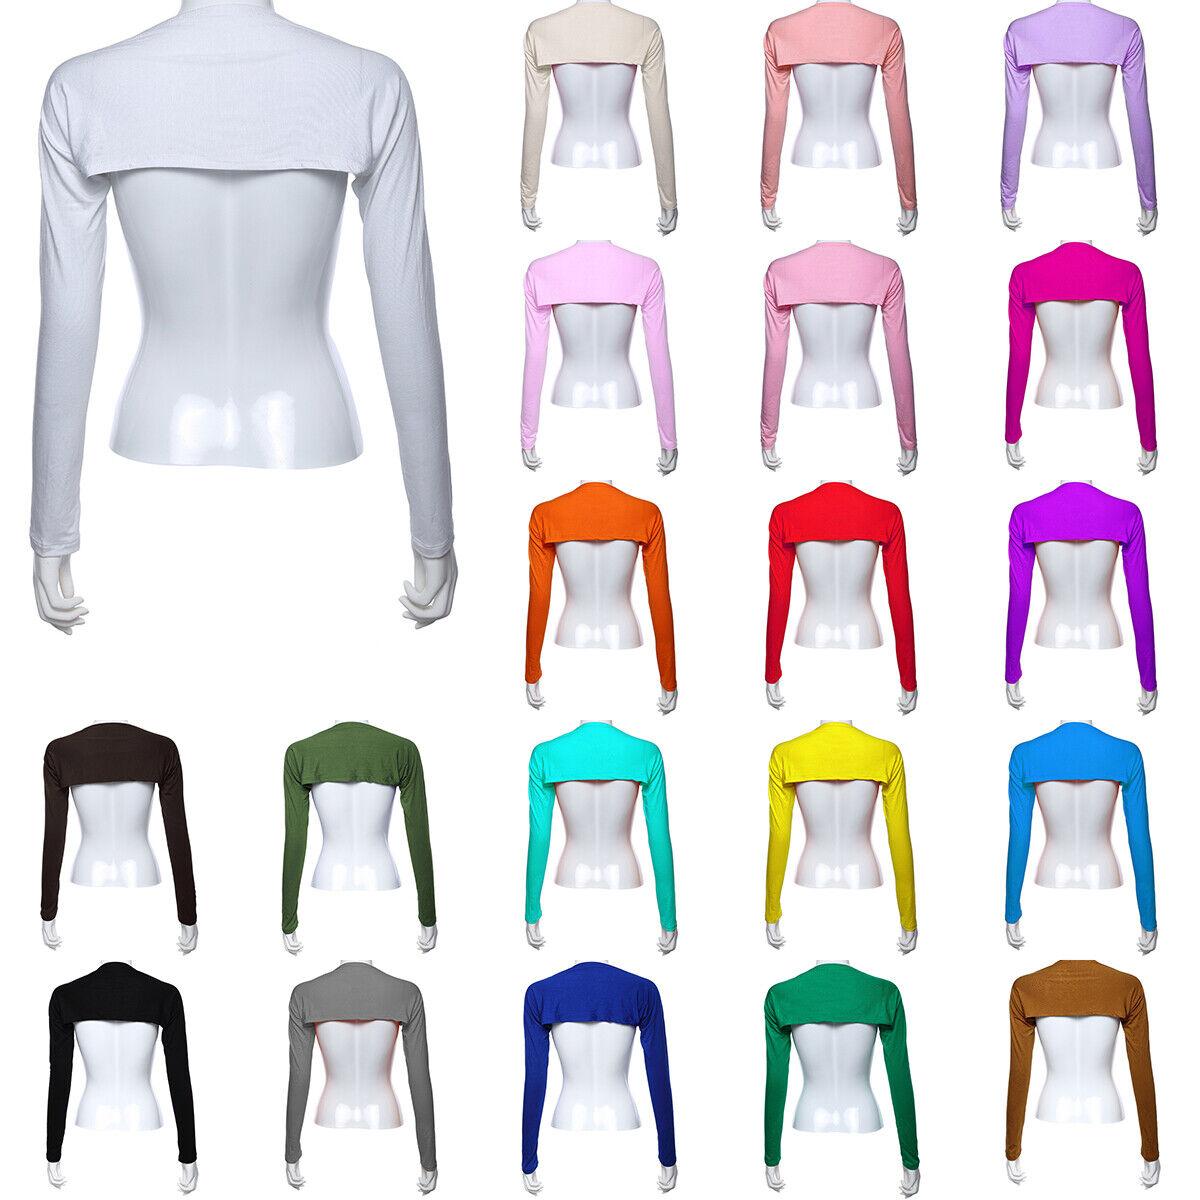 Ramadan Women One-Piece Sleeve Arm Cover Shrug Crop Hijab Muslim Islamic Top Hot